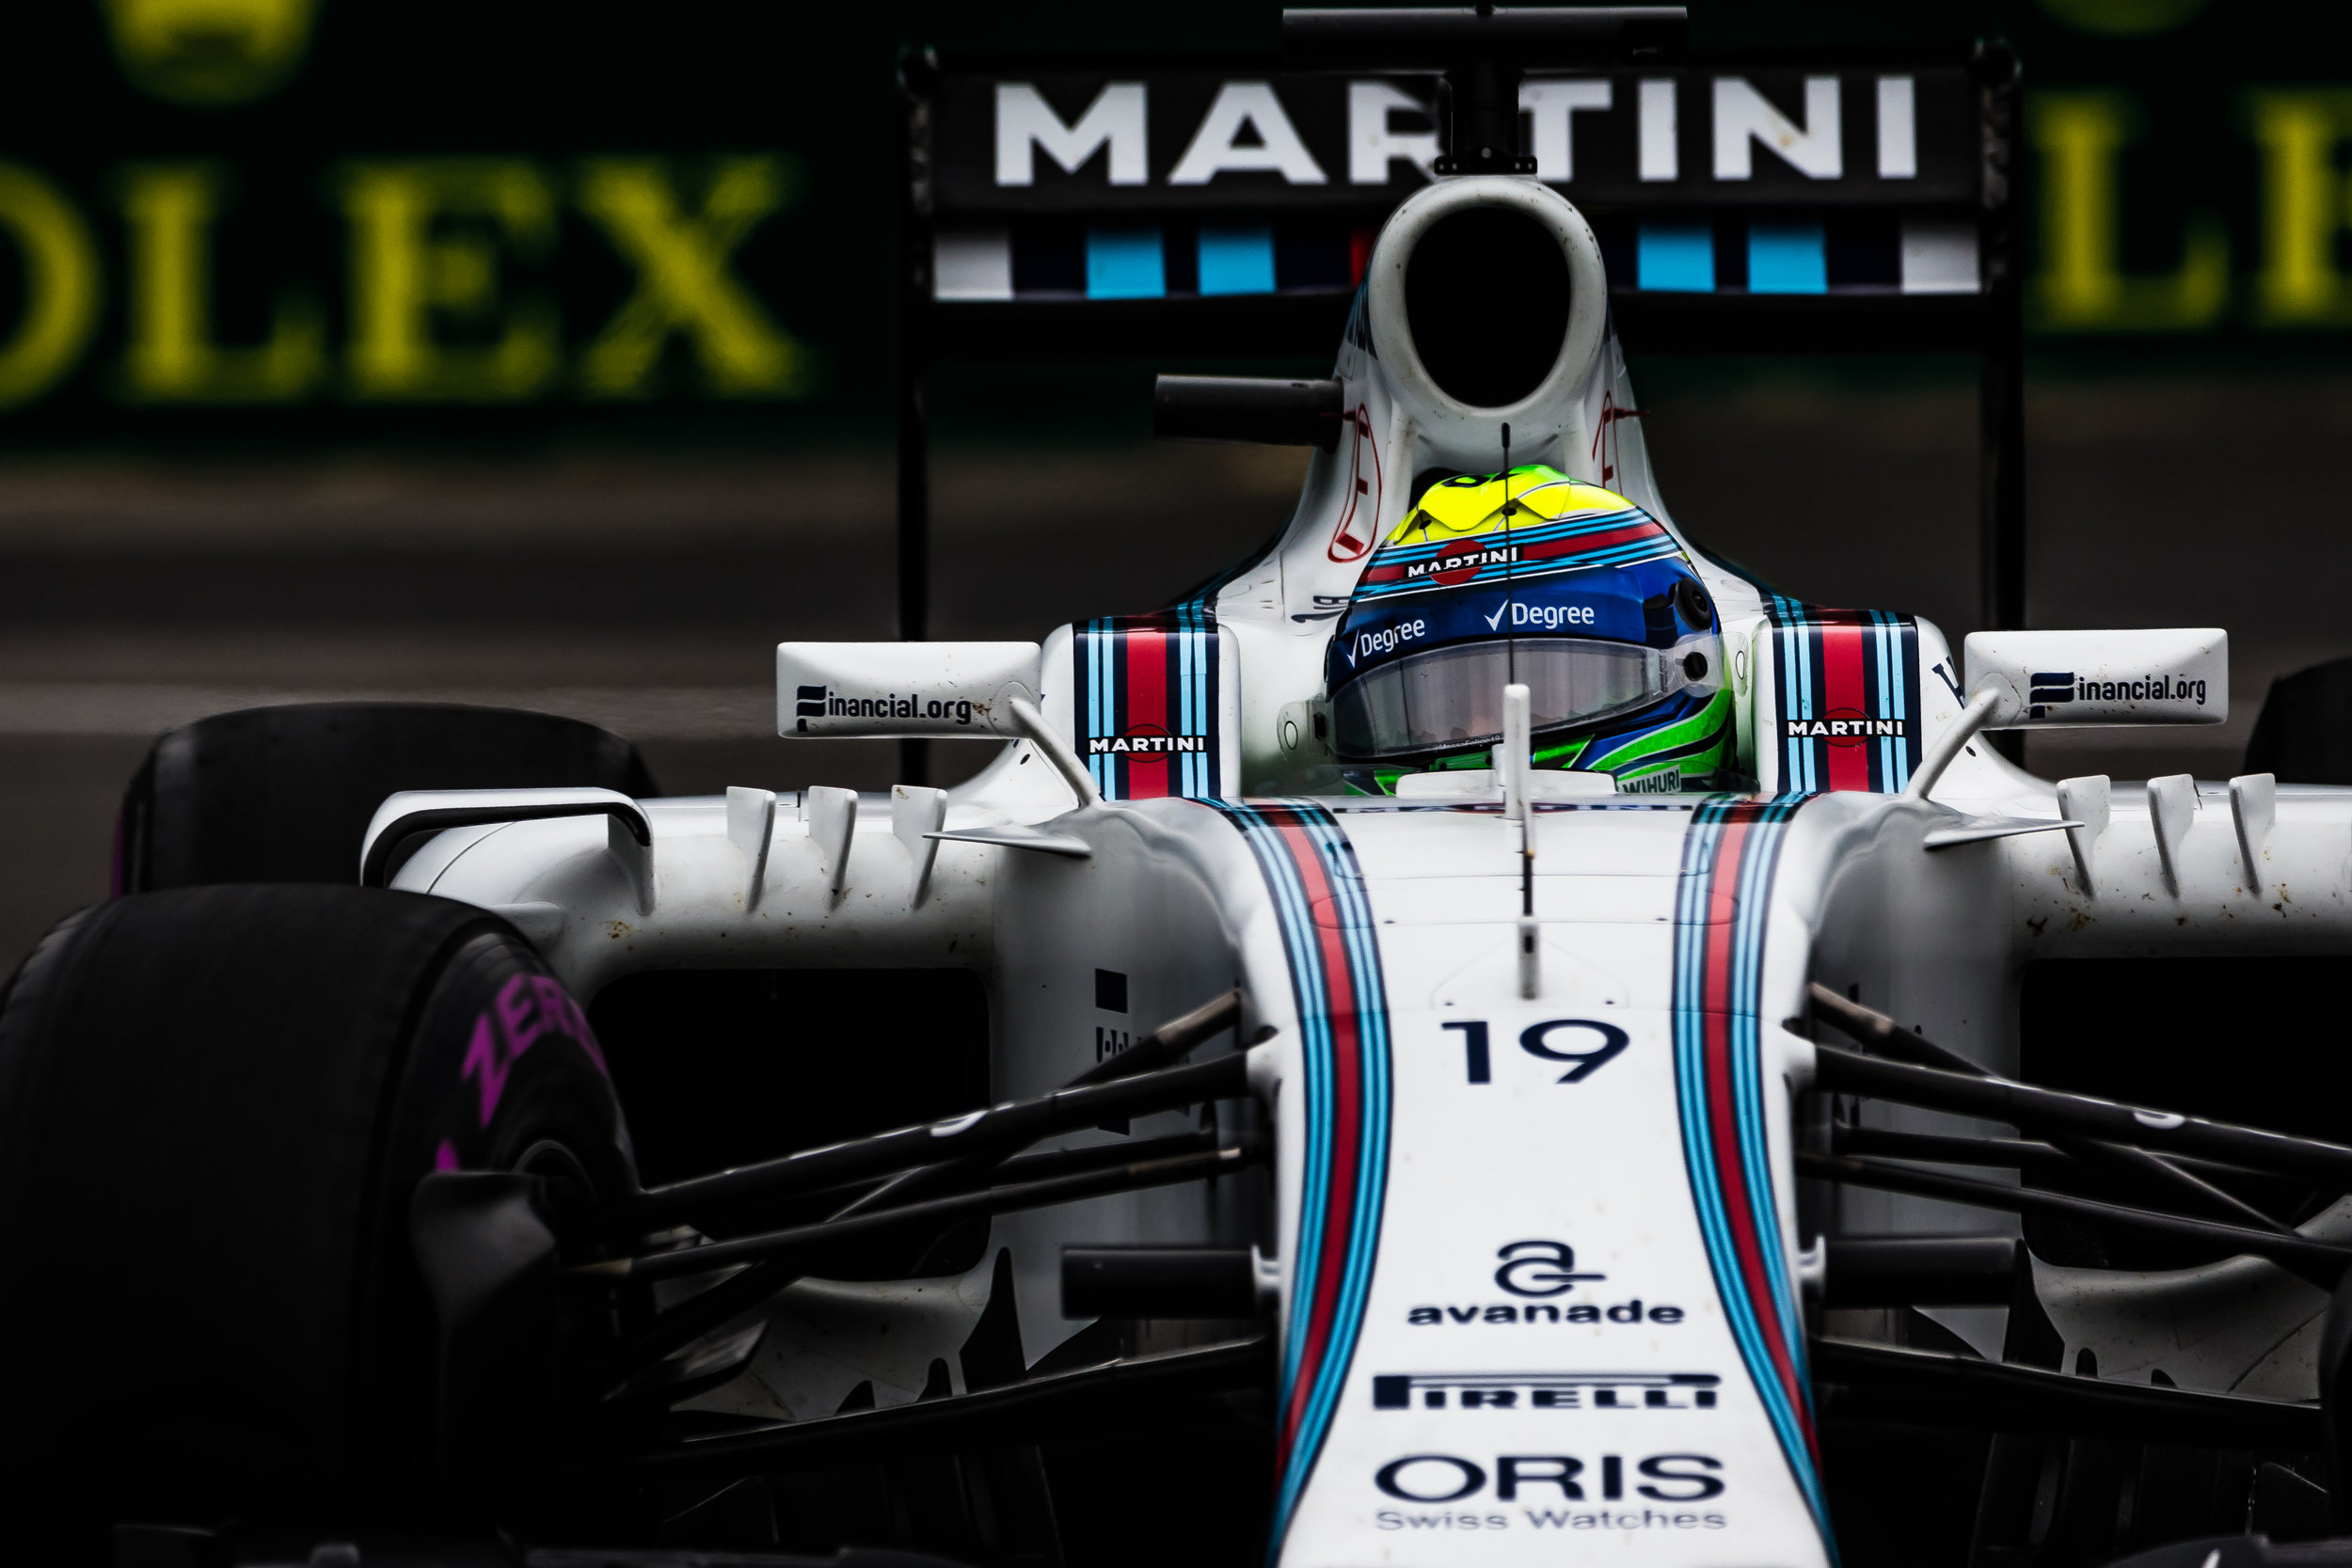 F1 - Canadian Grand Prix 2016-9522.jpg